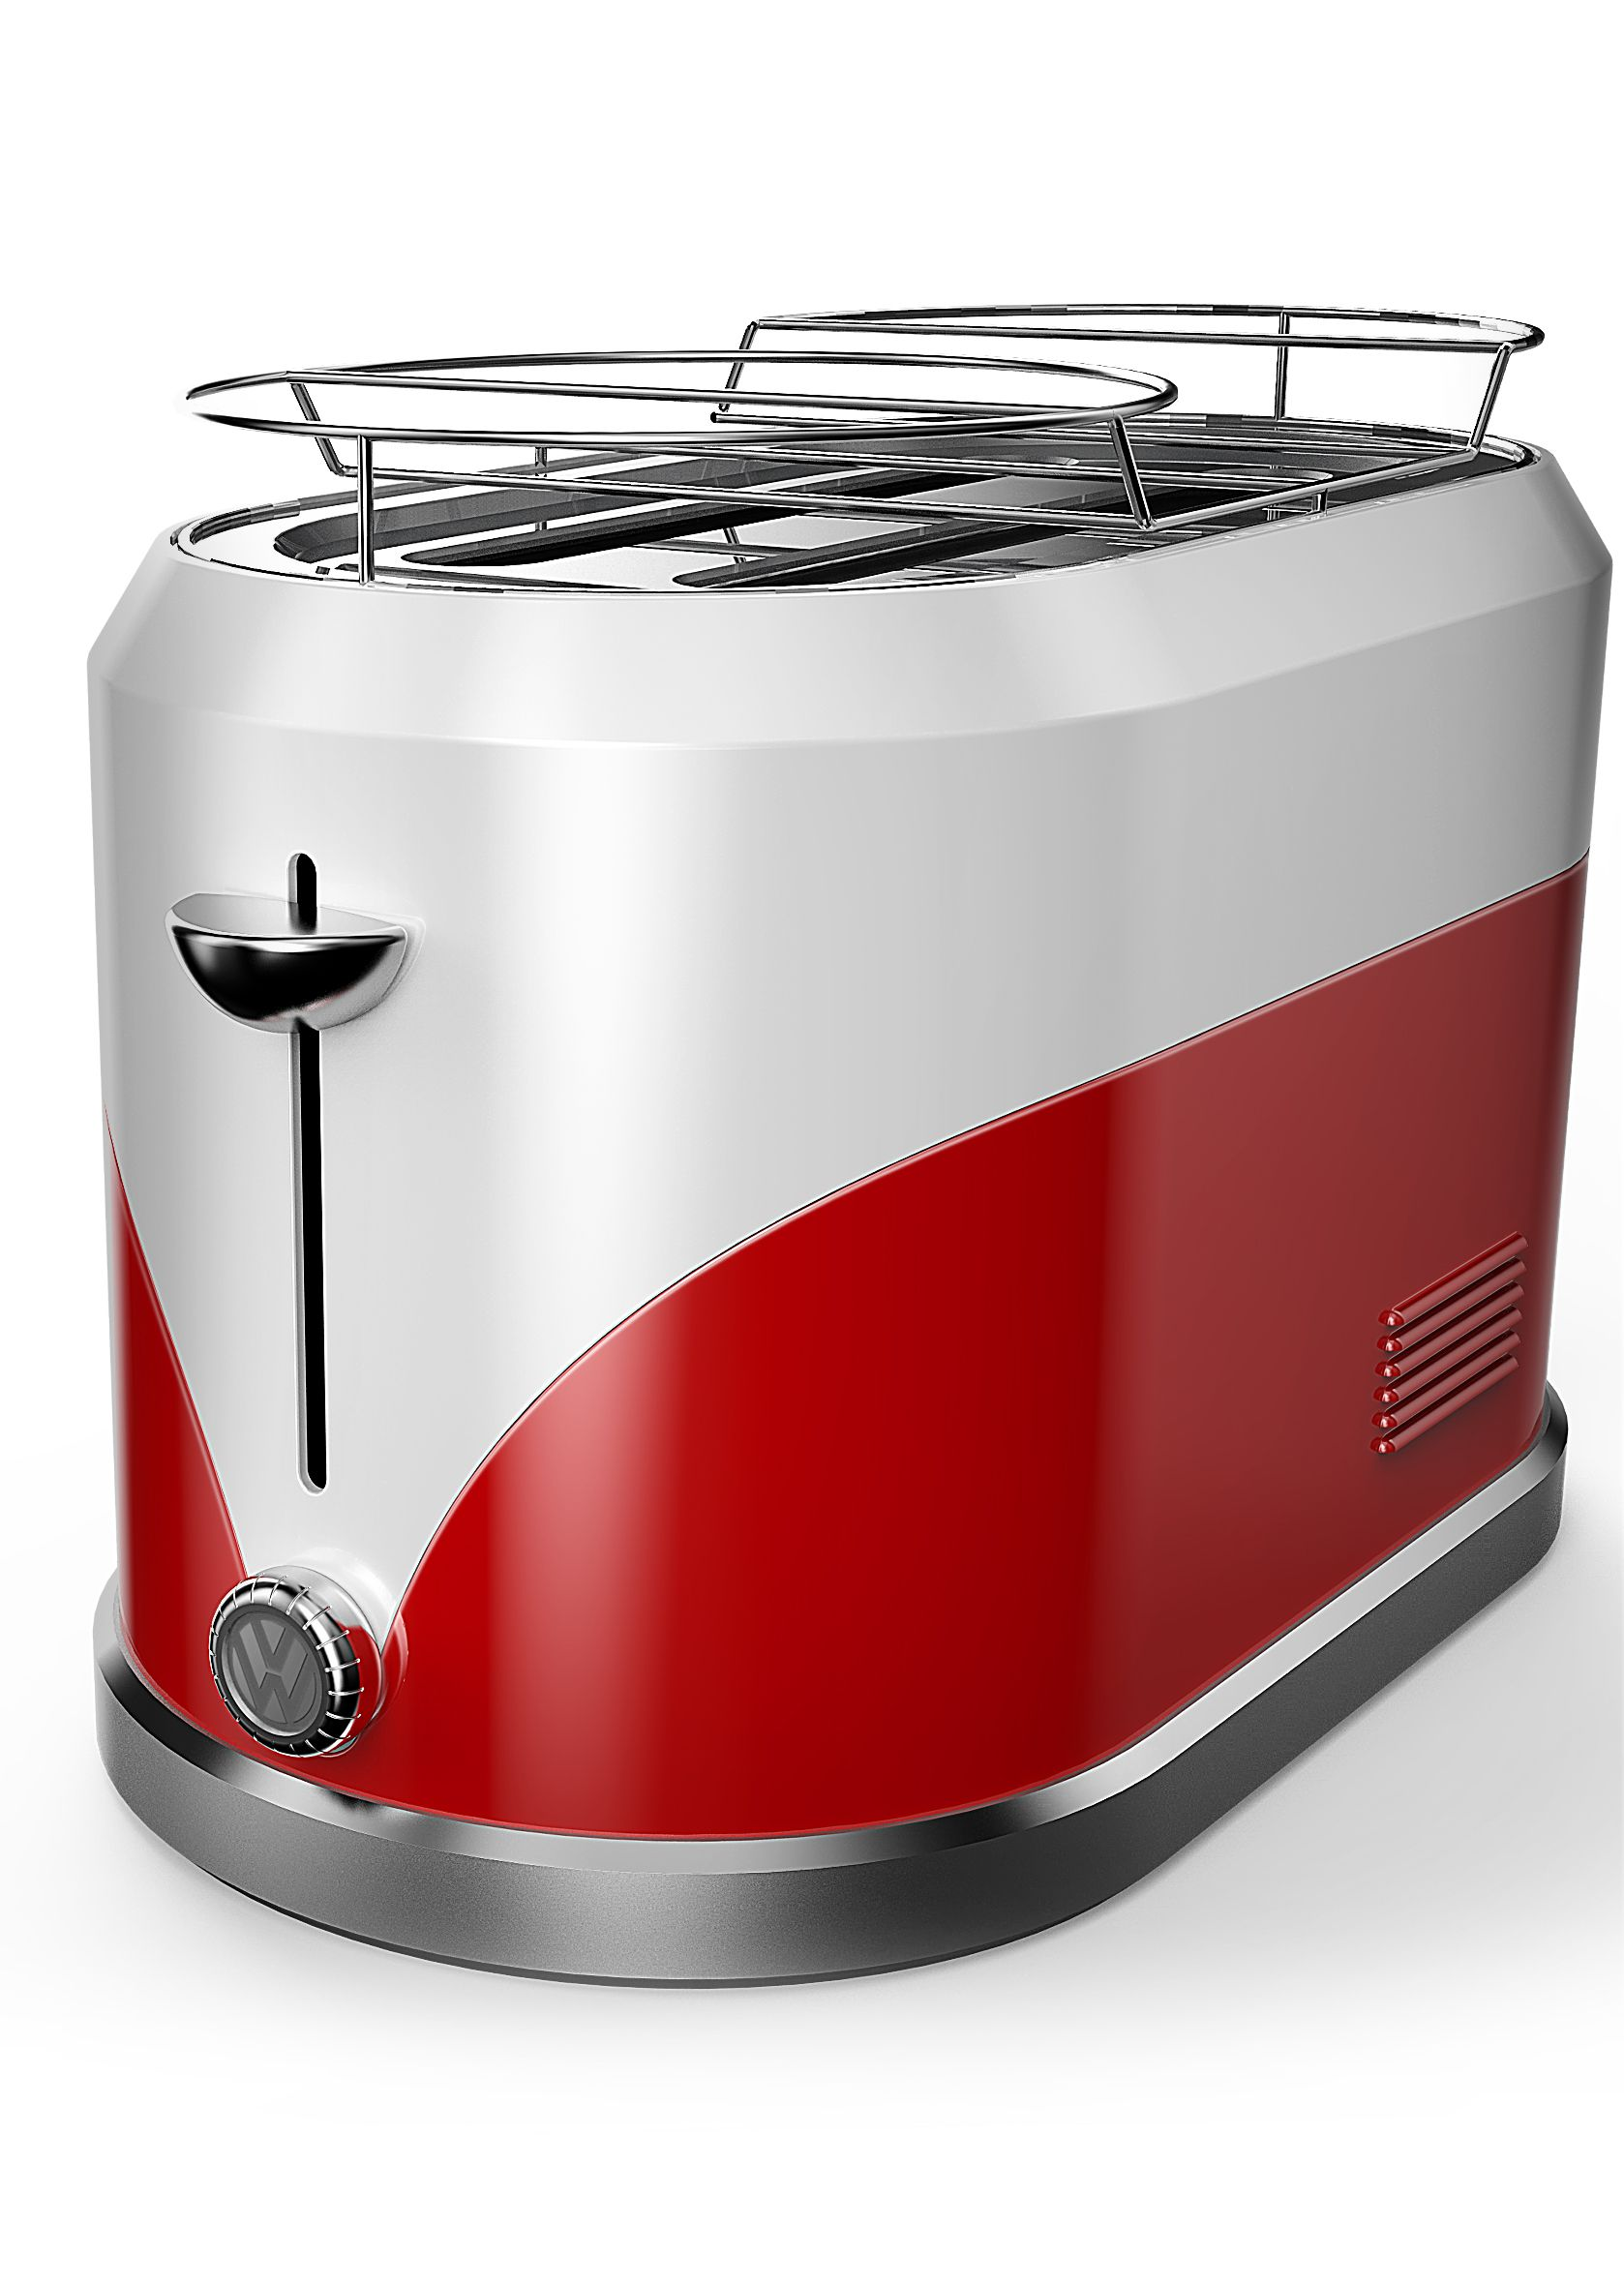 toaster toasters australia conveyor south ireland rental africa industrial